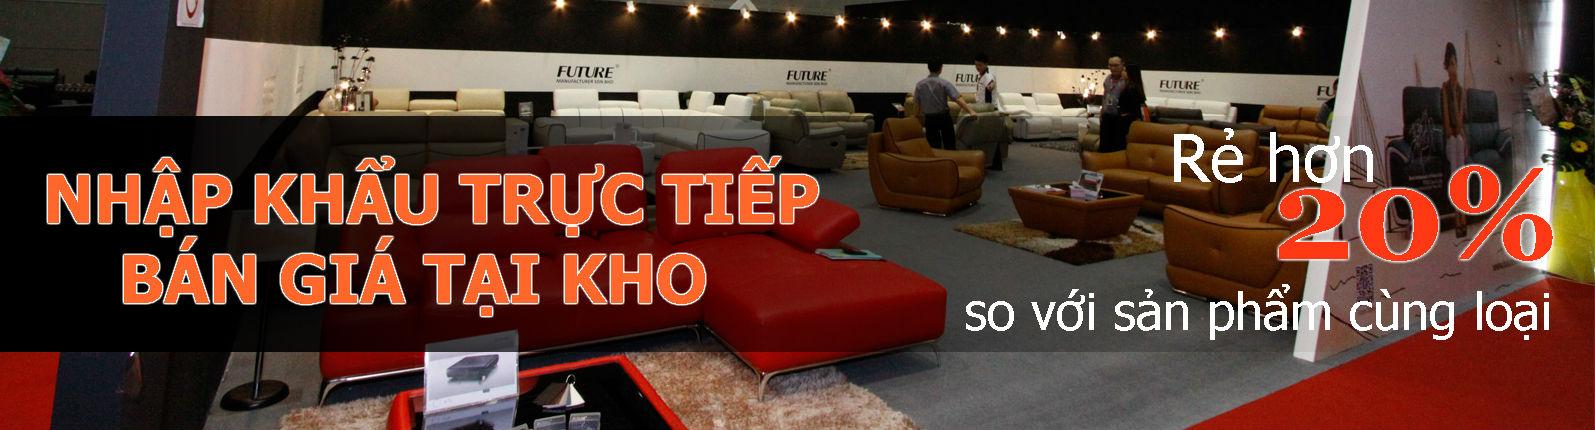 Sofa da chữ L Future Model 7037 giảm giá tới 40% saigonsofa.com